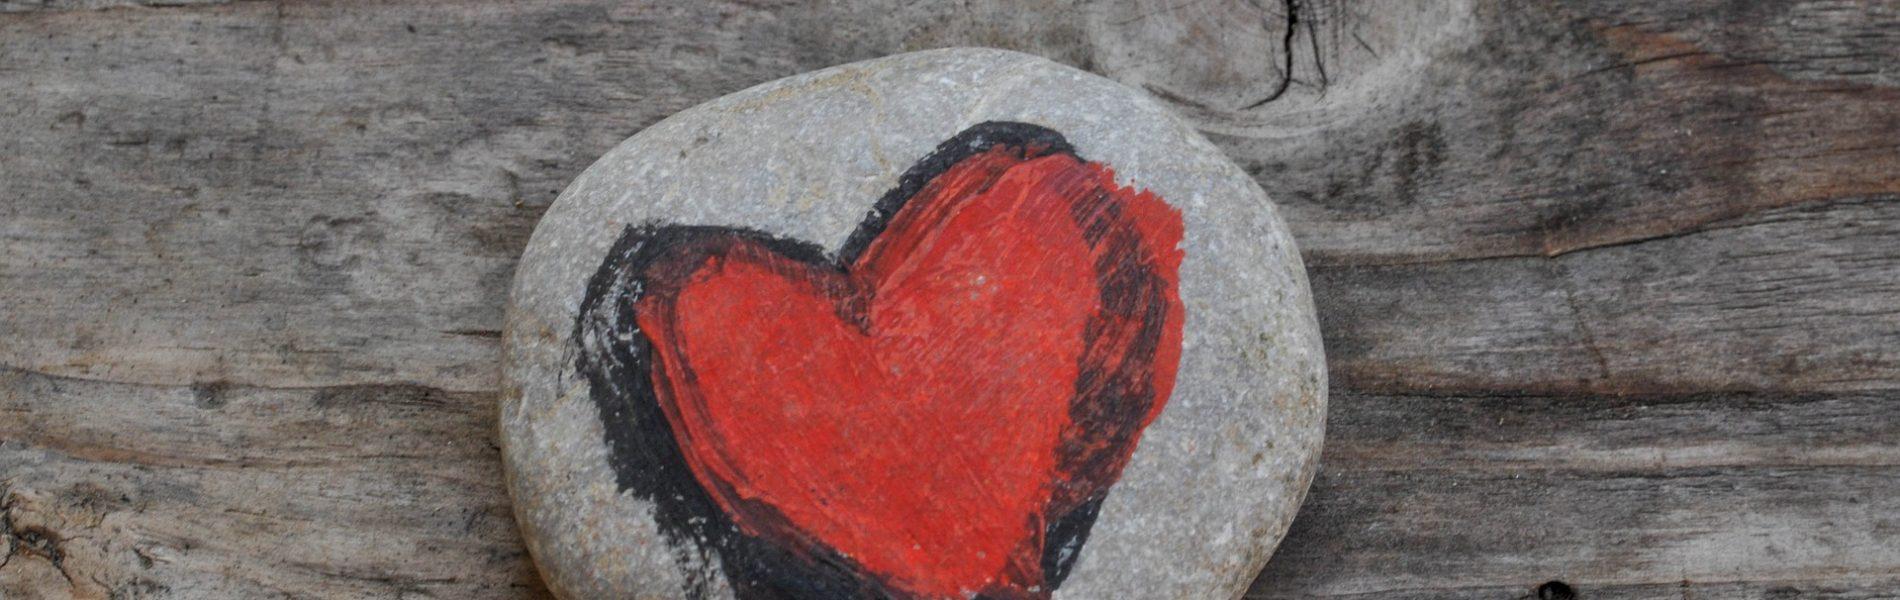 heart-5025684_1920